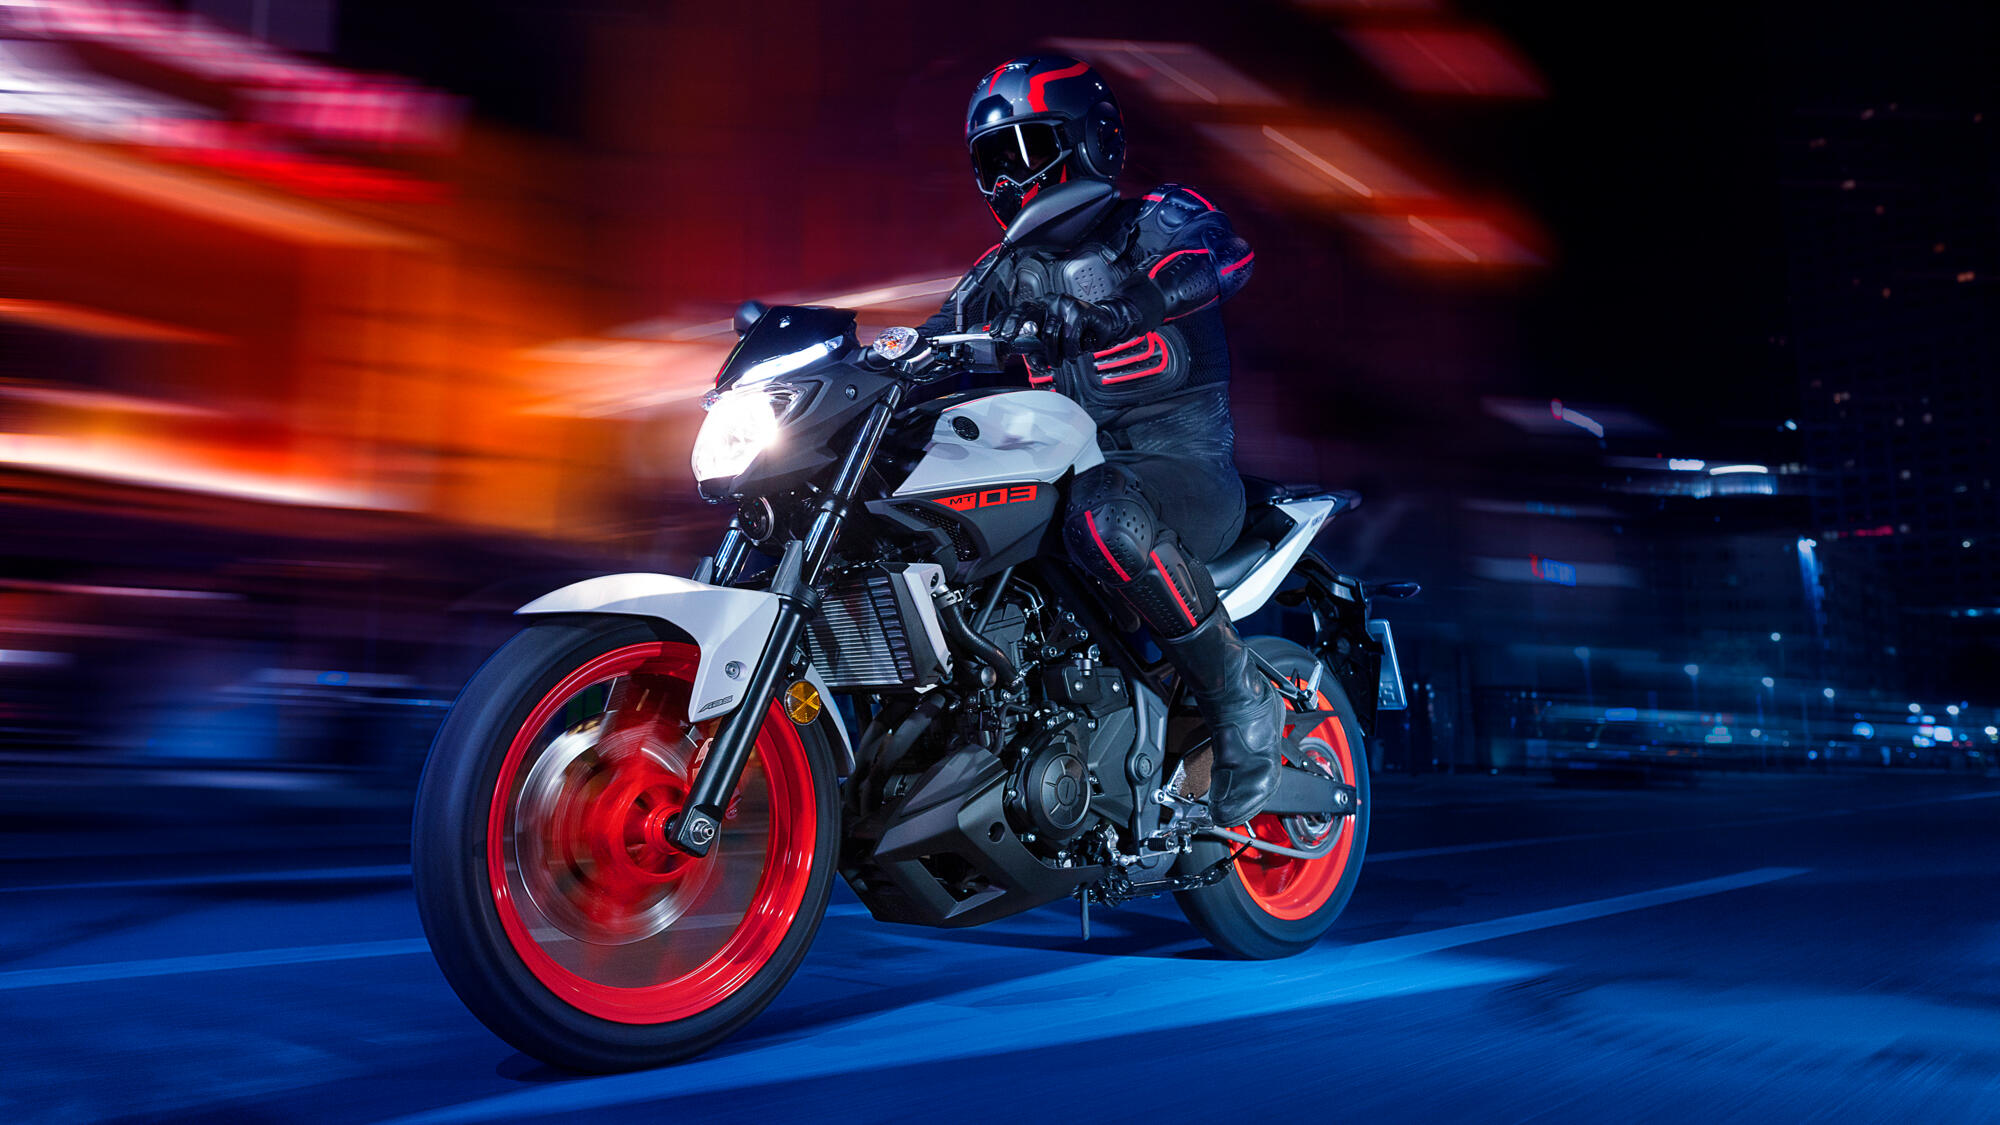 mt-03 - motorcycles